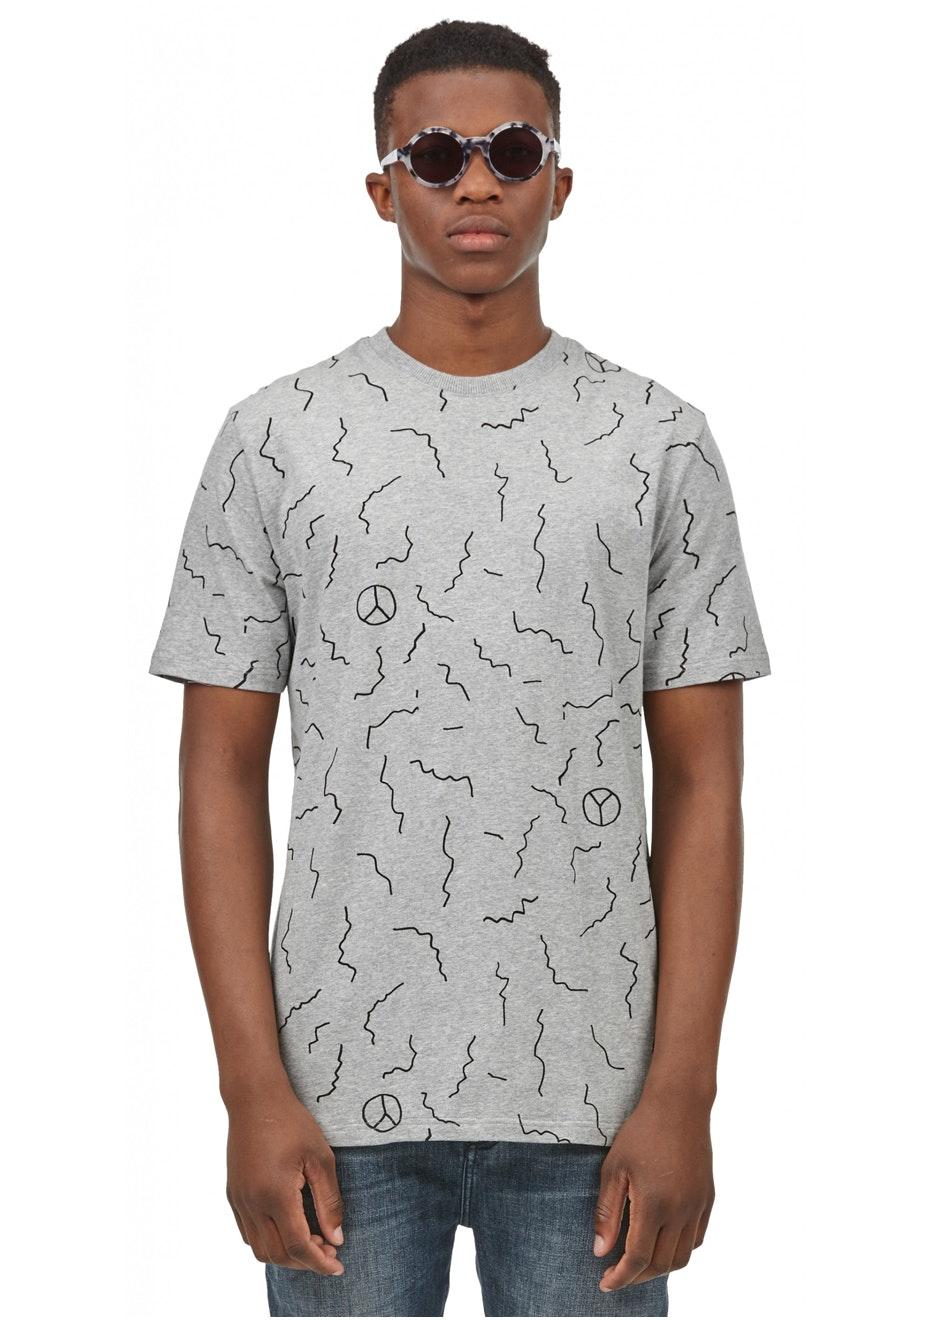 I Love Ugly - Mistake Print Tshirt - Grey